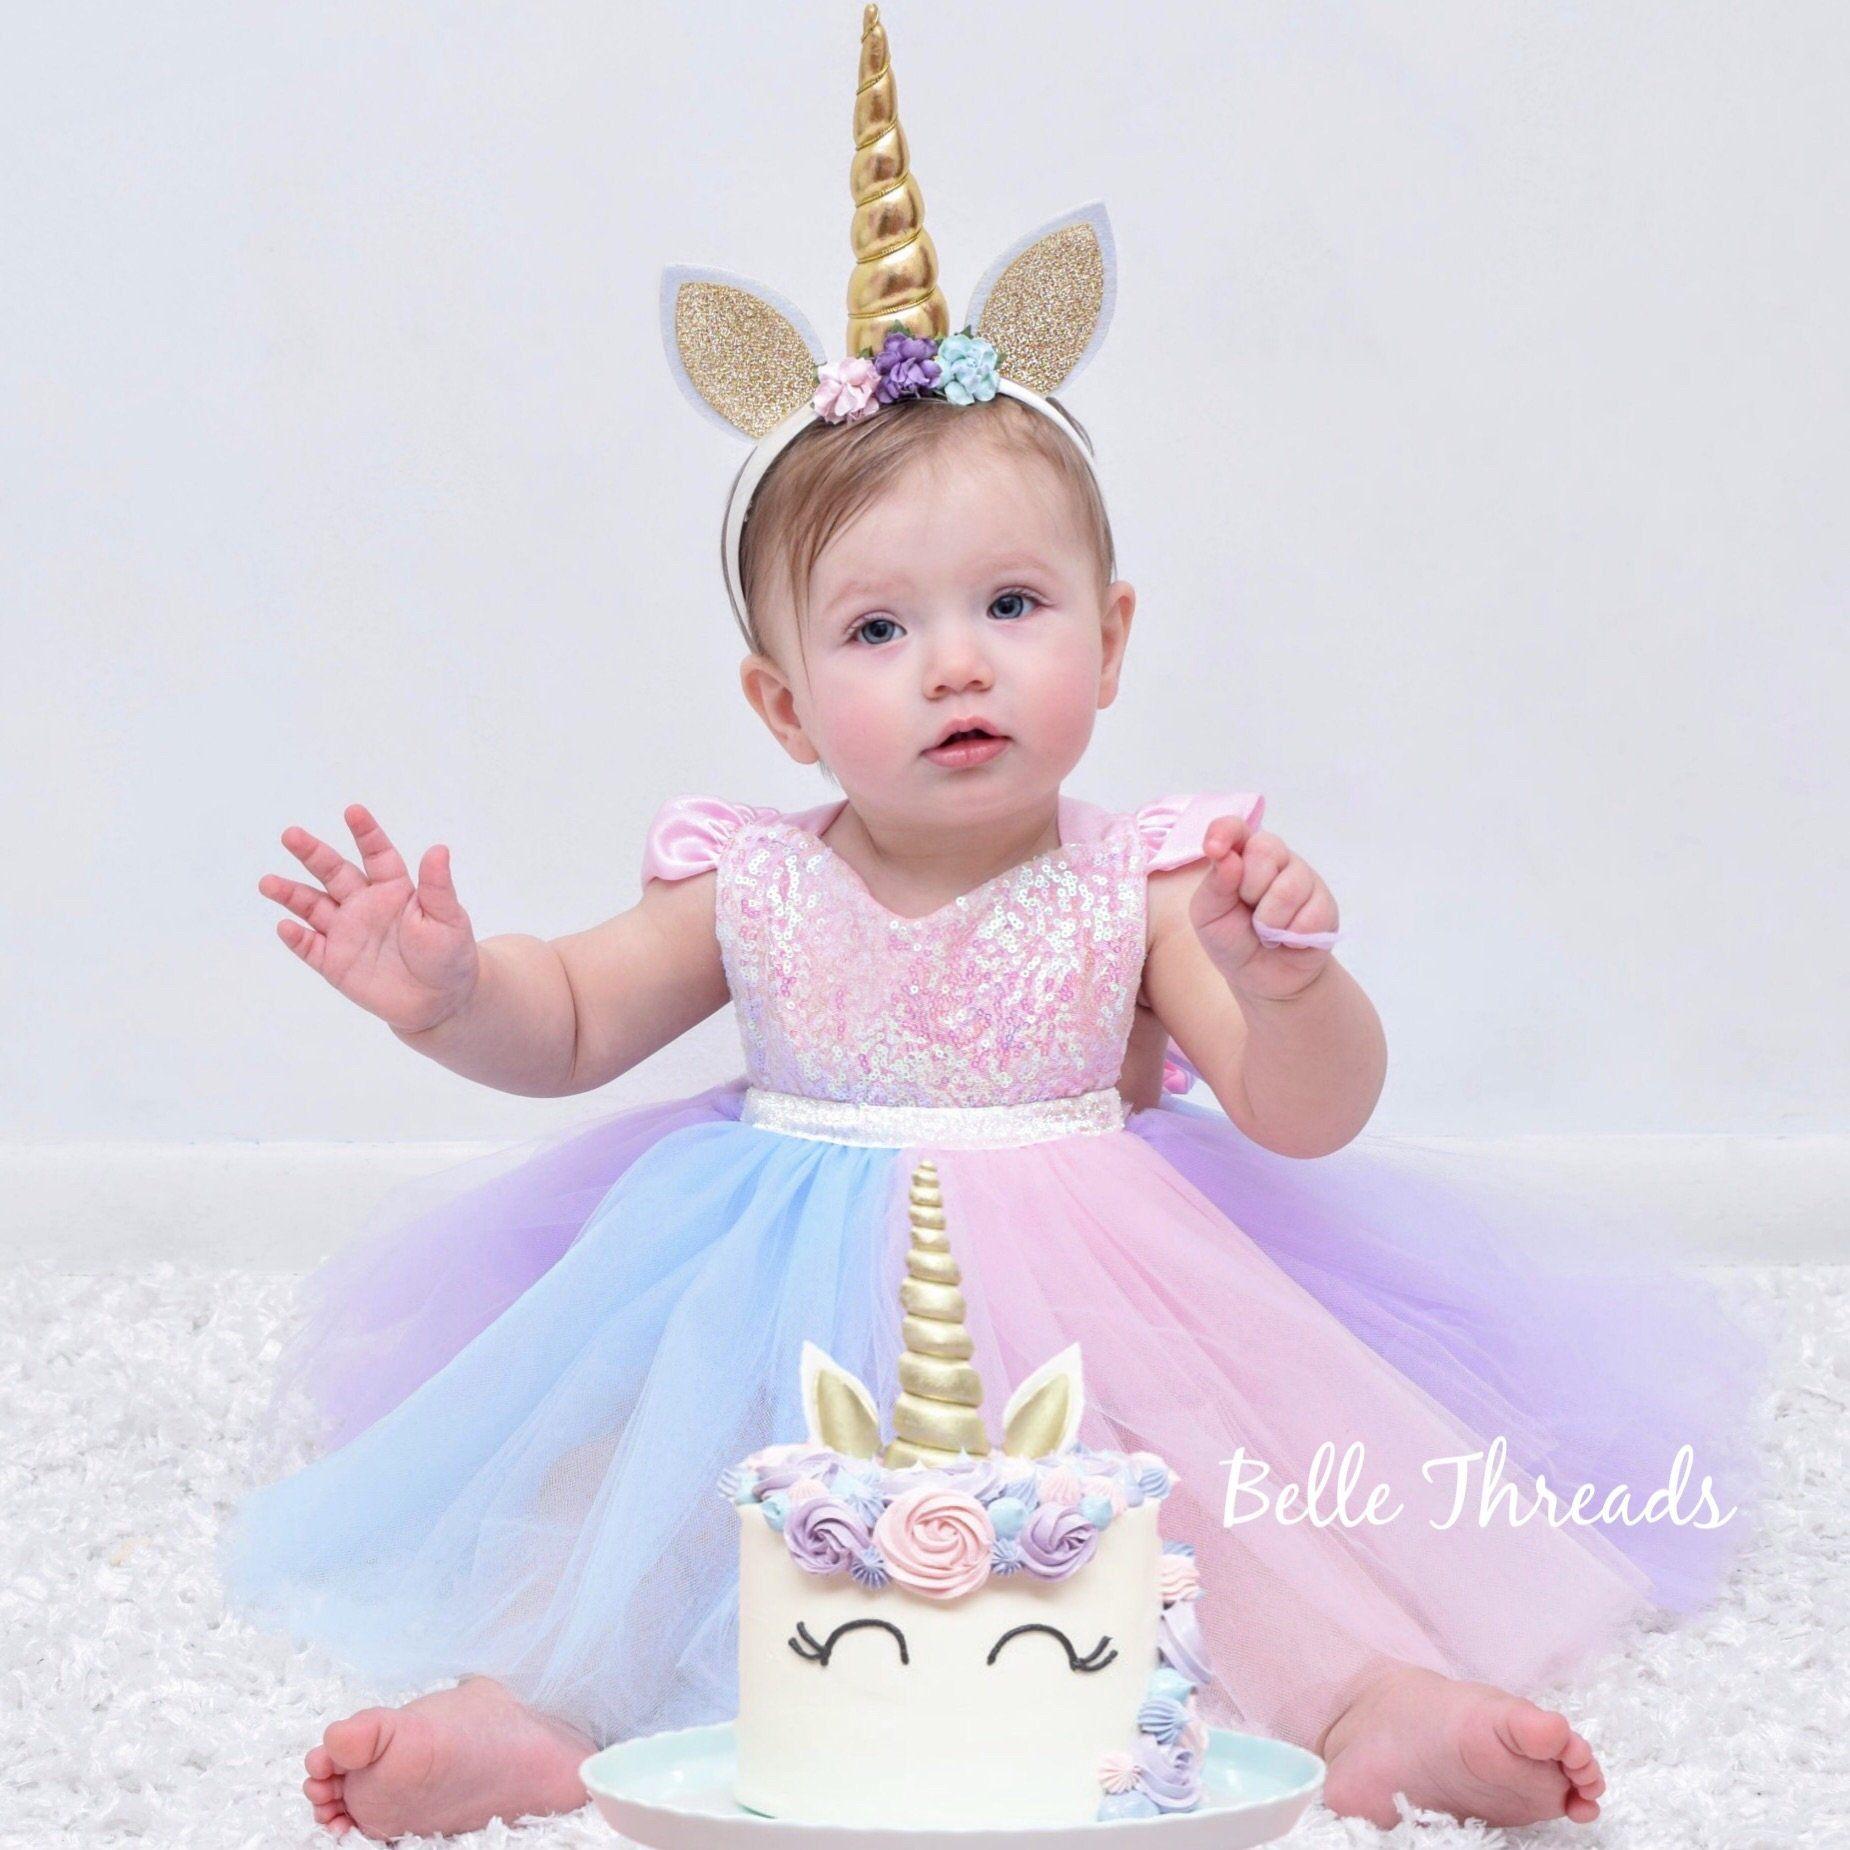 Unicorn Tutu Set Hot Pink Unicorn Birthday Outfit Girl Unicorn Birthday Outfit Girl Unicorn Outfit Girl Toddler Unicorn Birthday Outfit